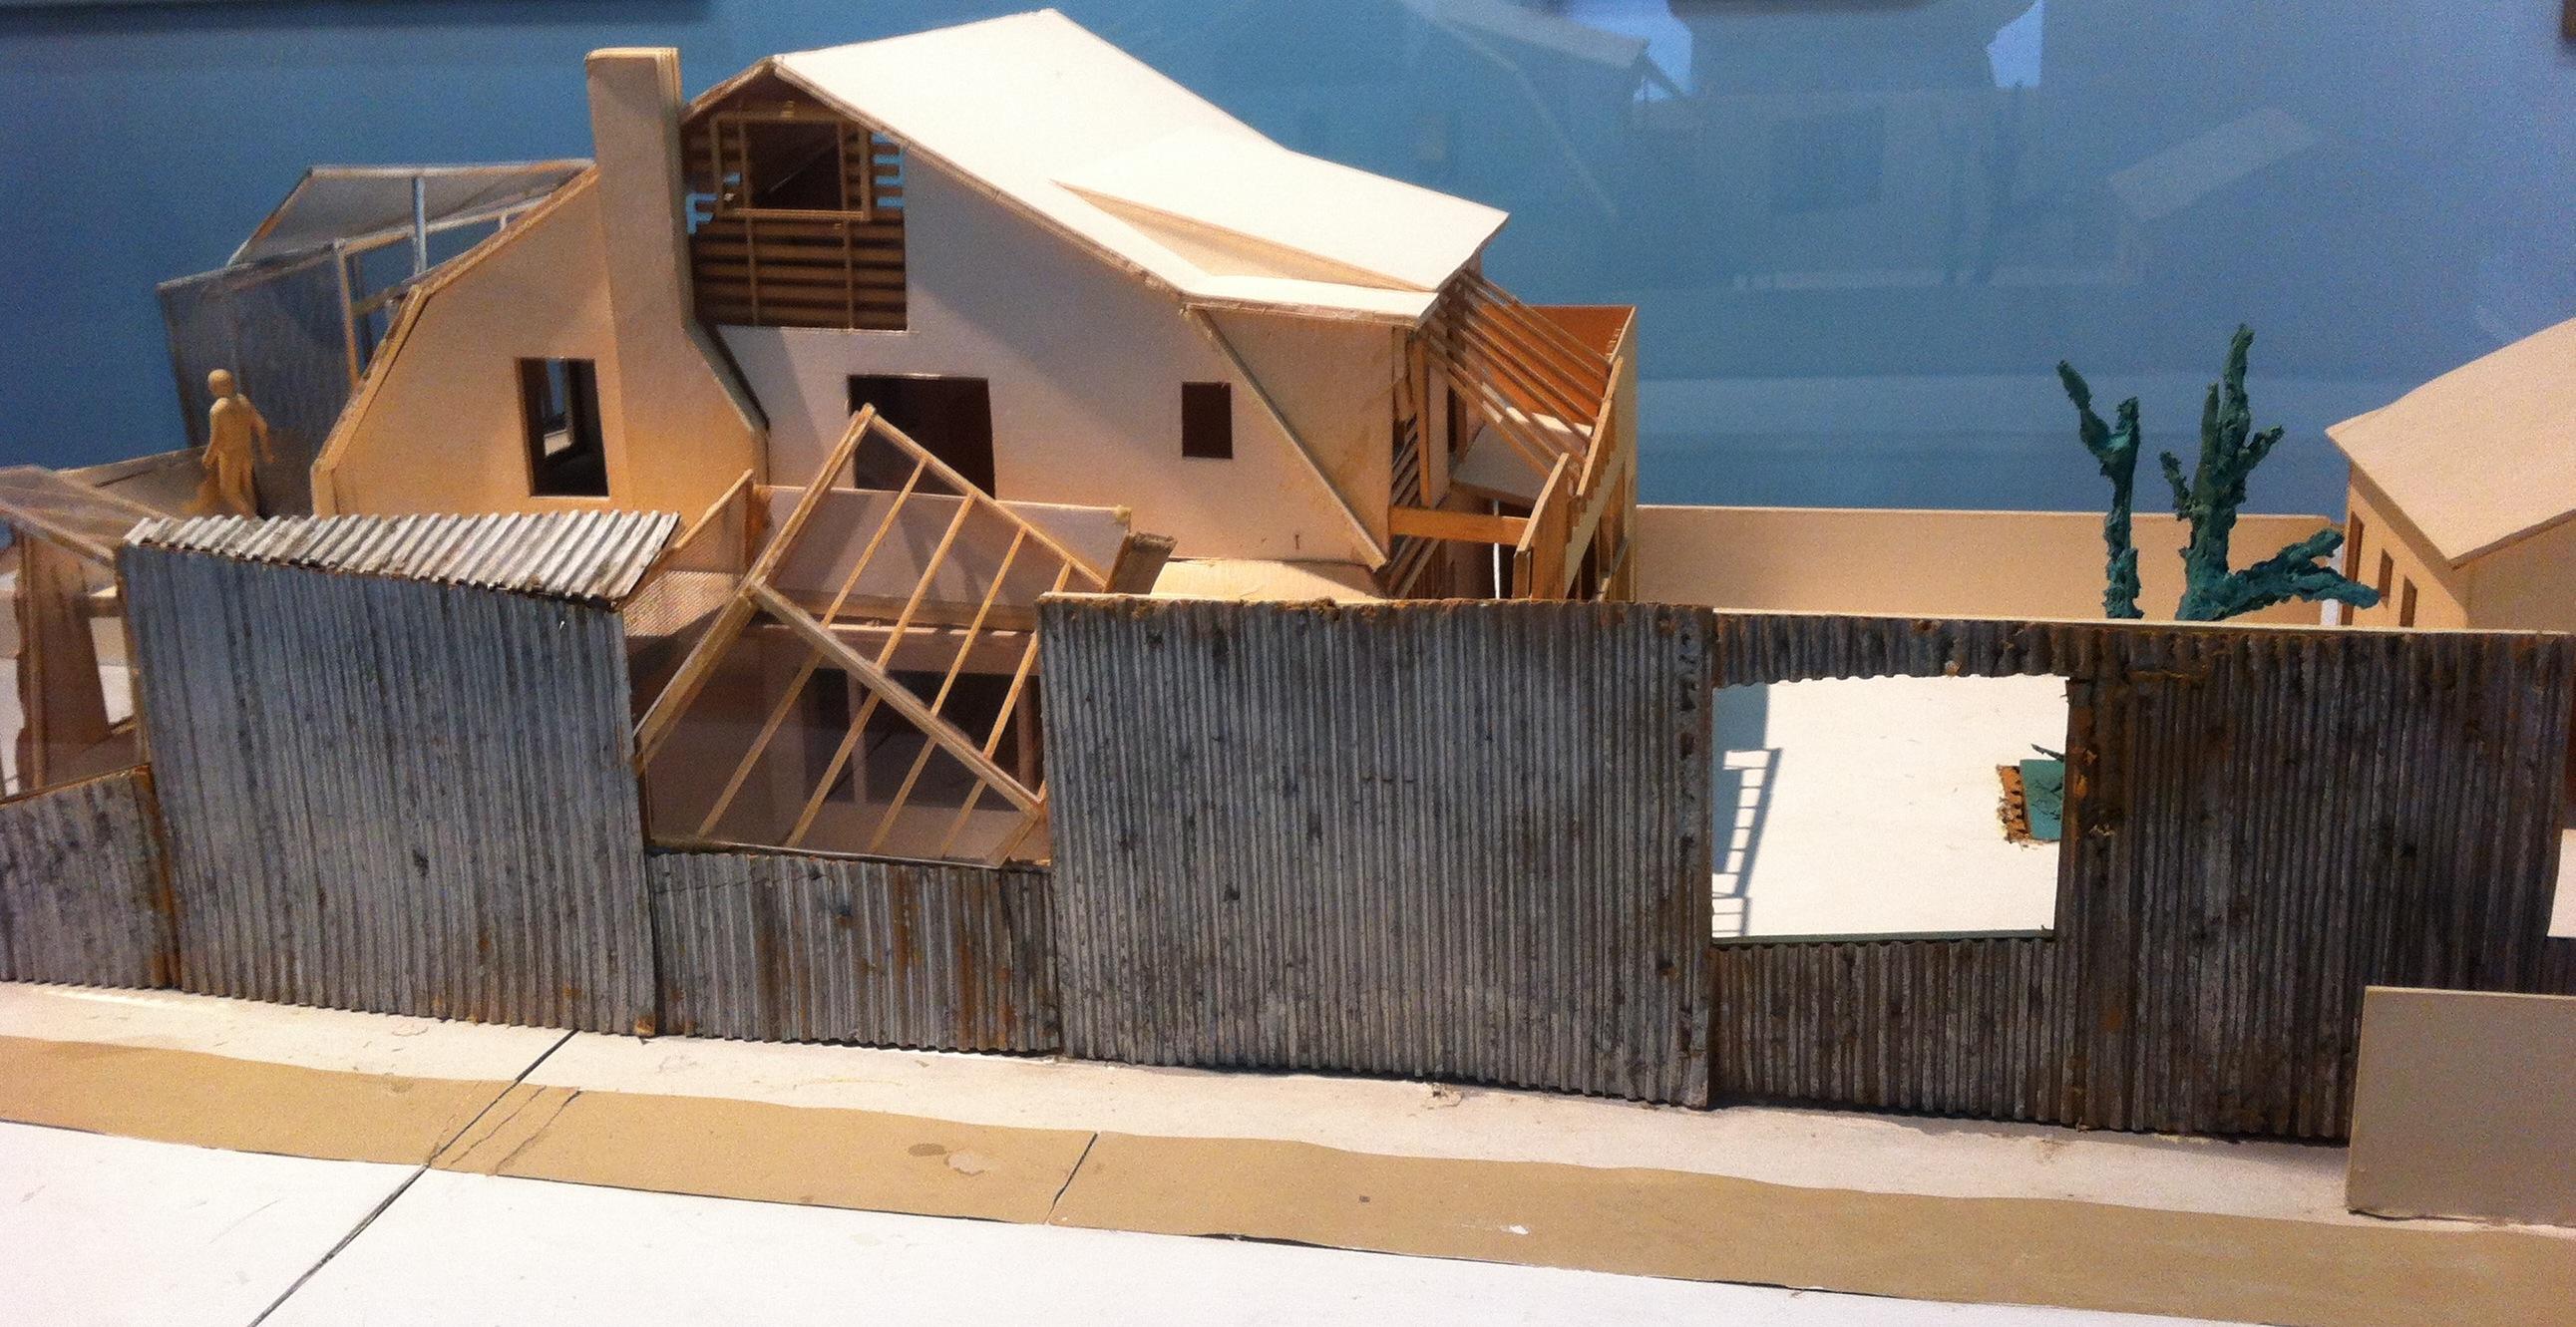 Gehry Résidence ( Santa Monica, Etas-Unis), 1977-1978 et 1991-1994